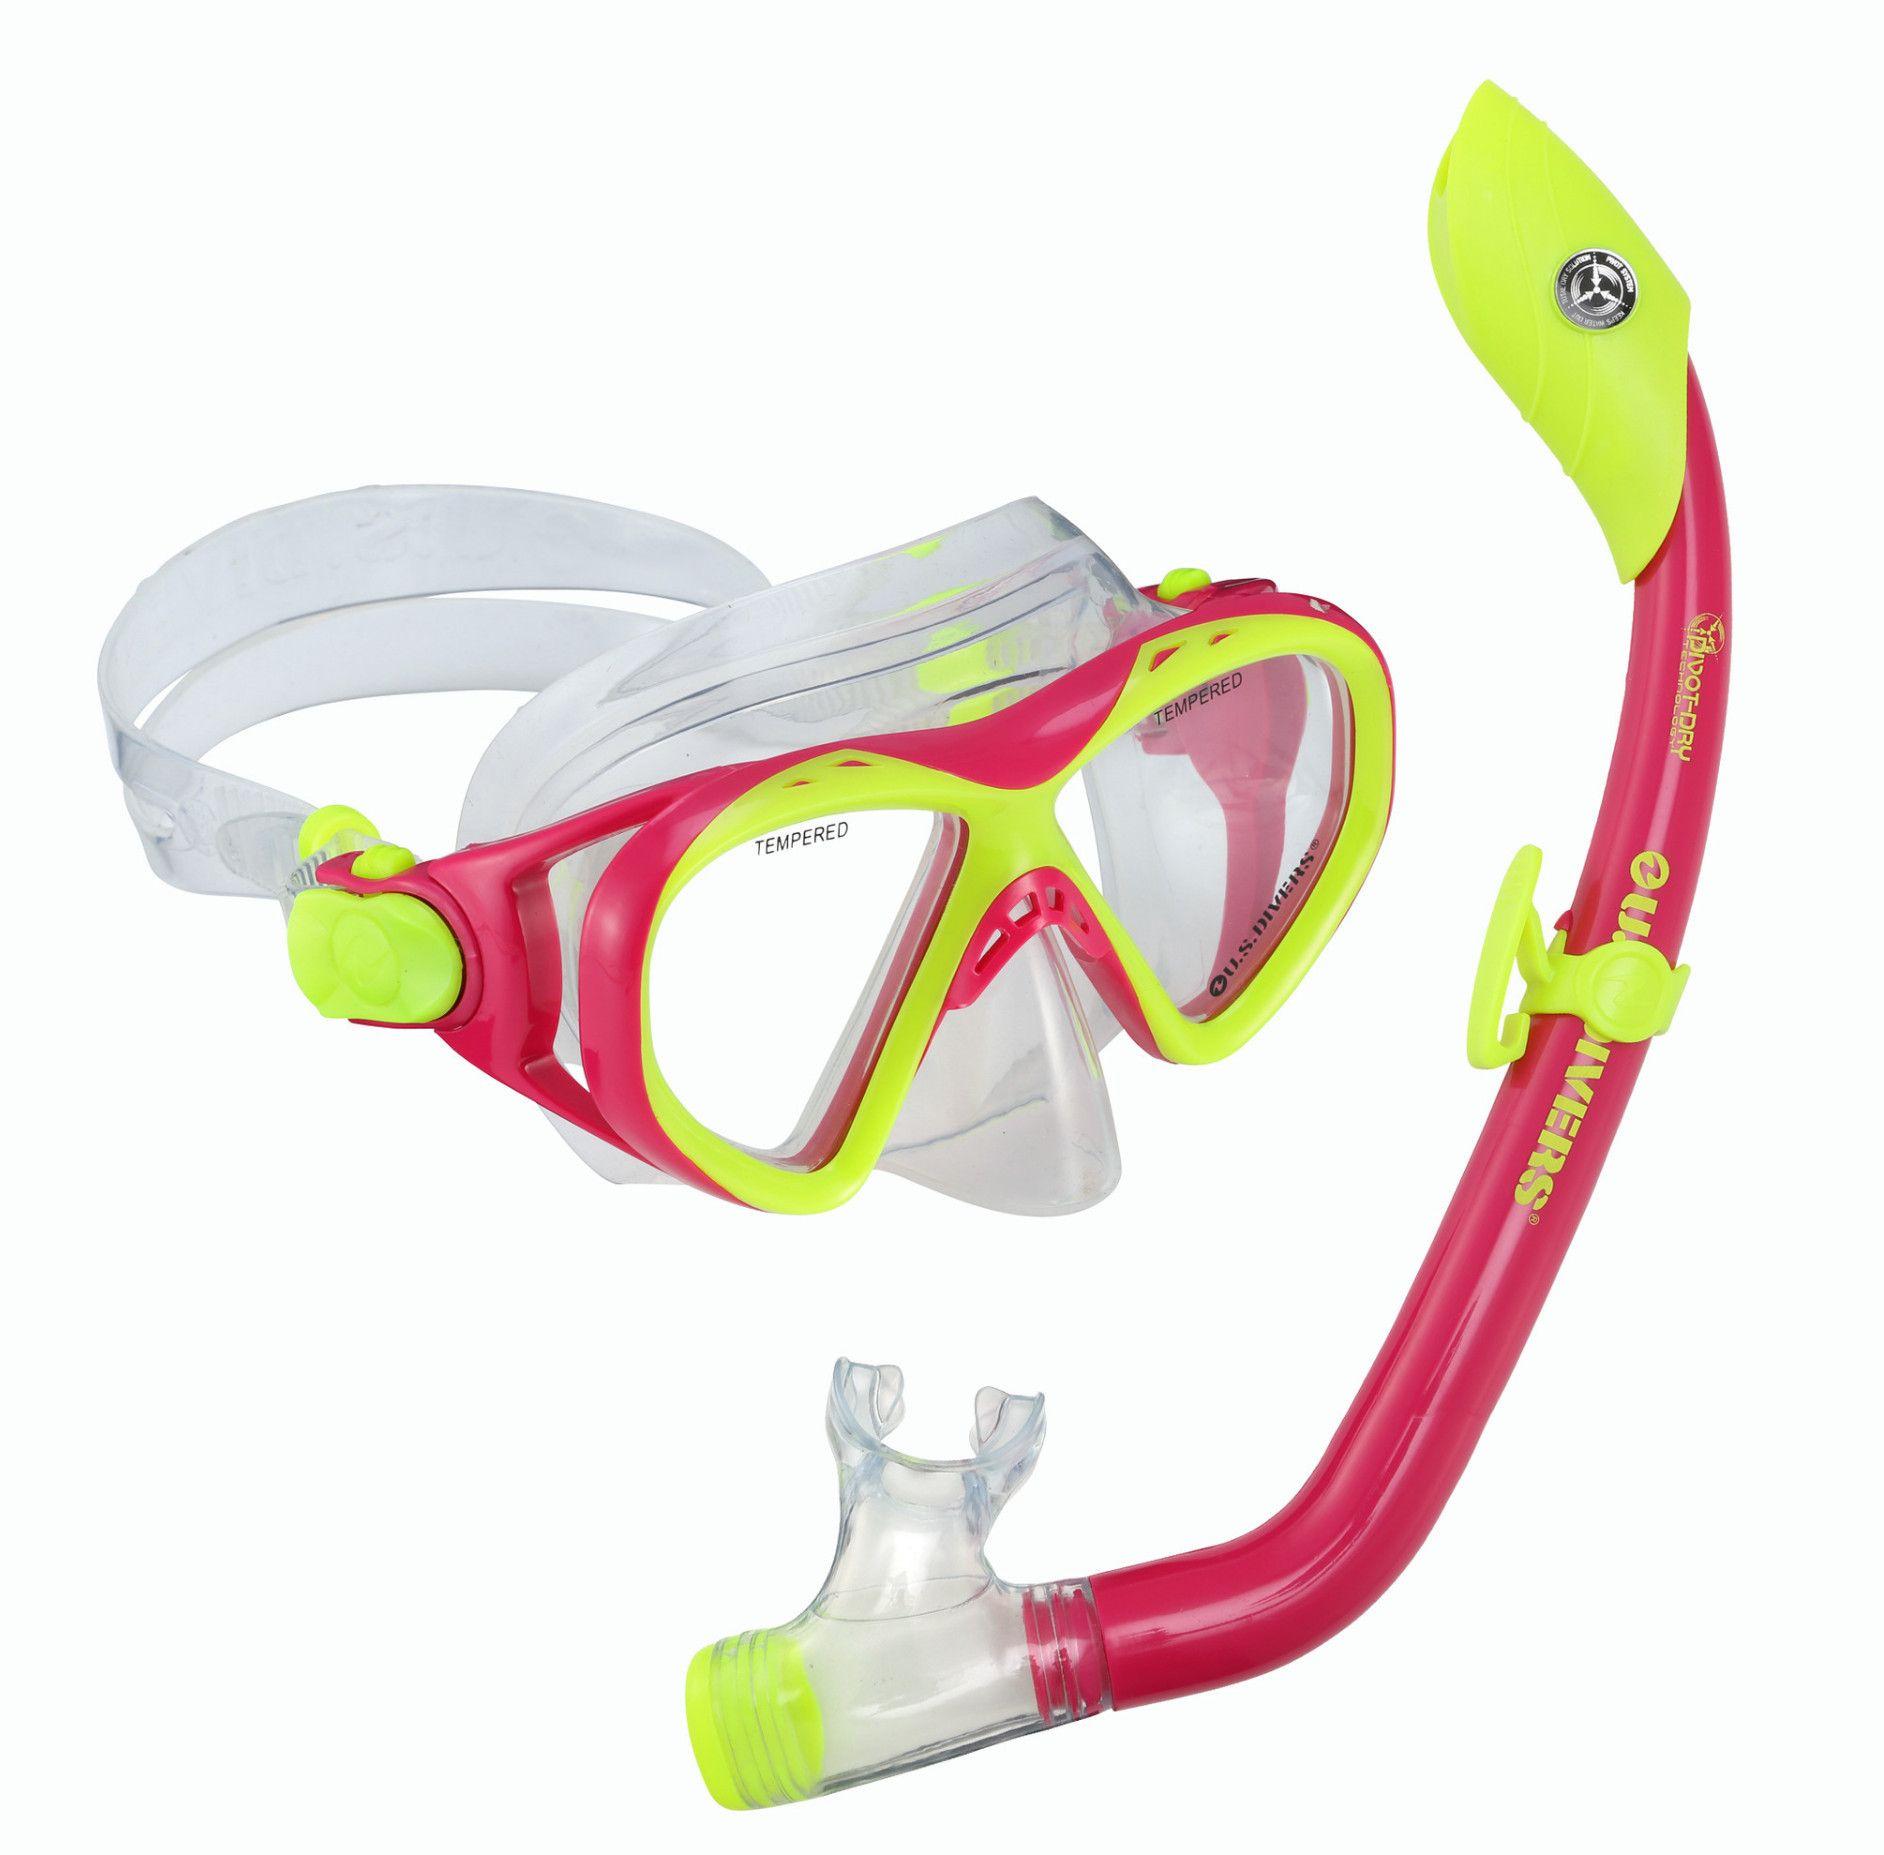 9848c79cbf9 U.S. Divers Buzz + Sea Breeze JR Mask   Snorkel Pink Yellow